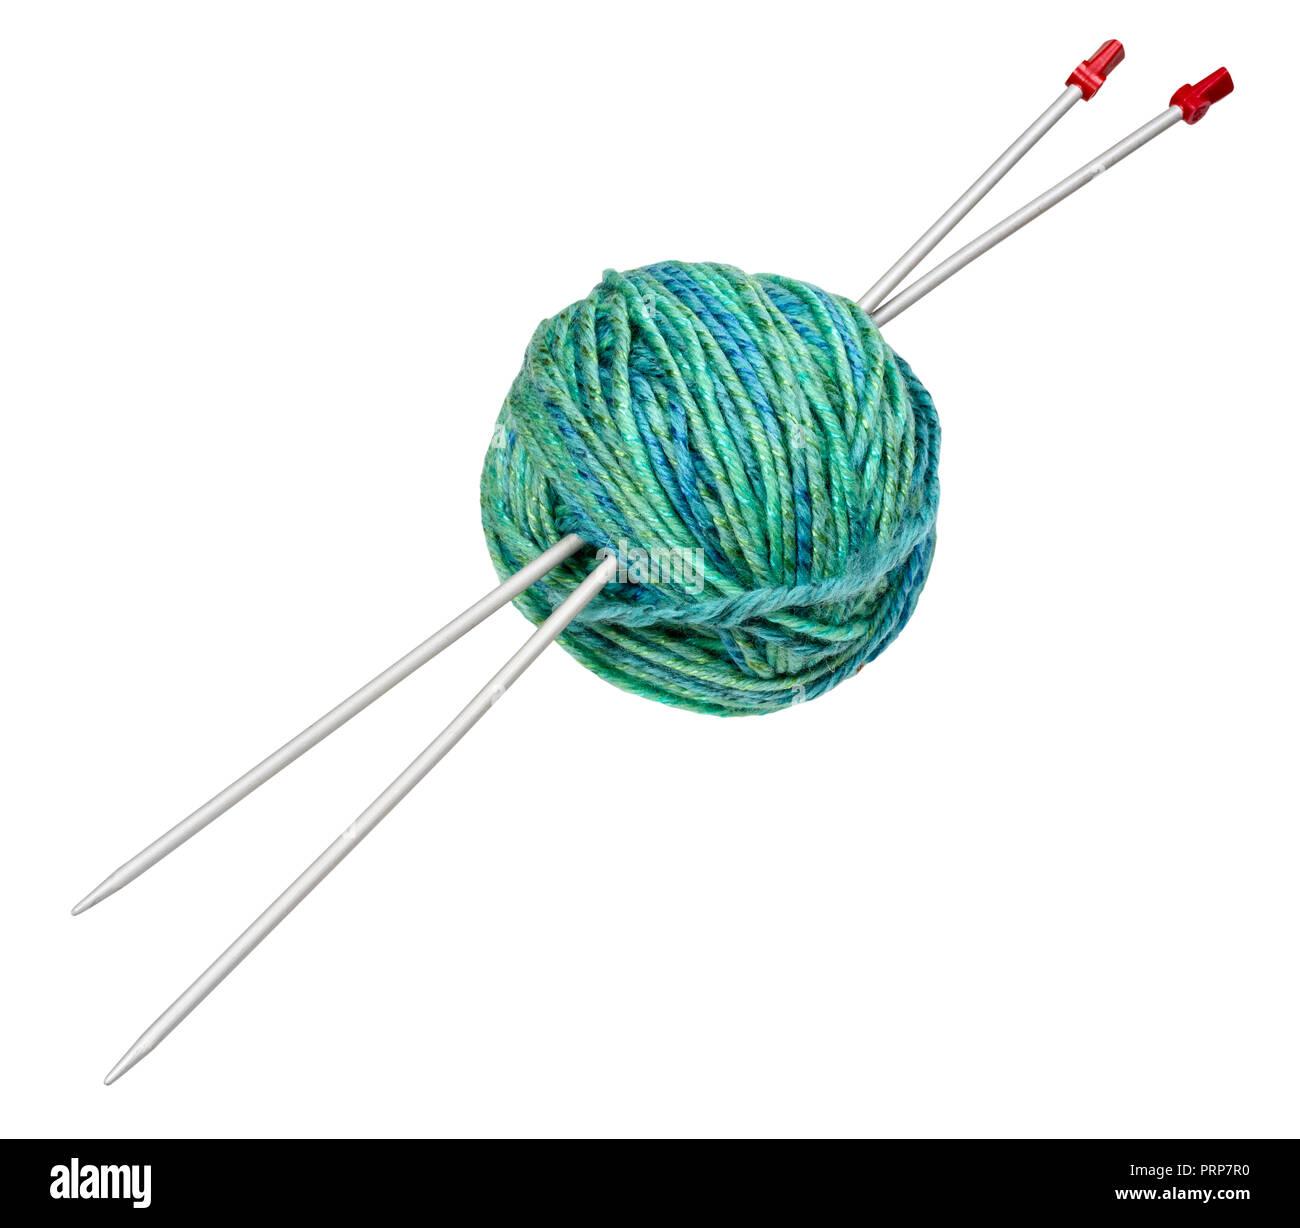 Green Yarn Imágenes De Stock & Green Yarn Fotos De Stock - Alamy